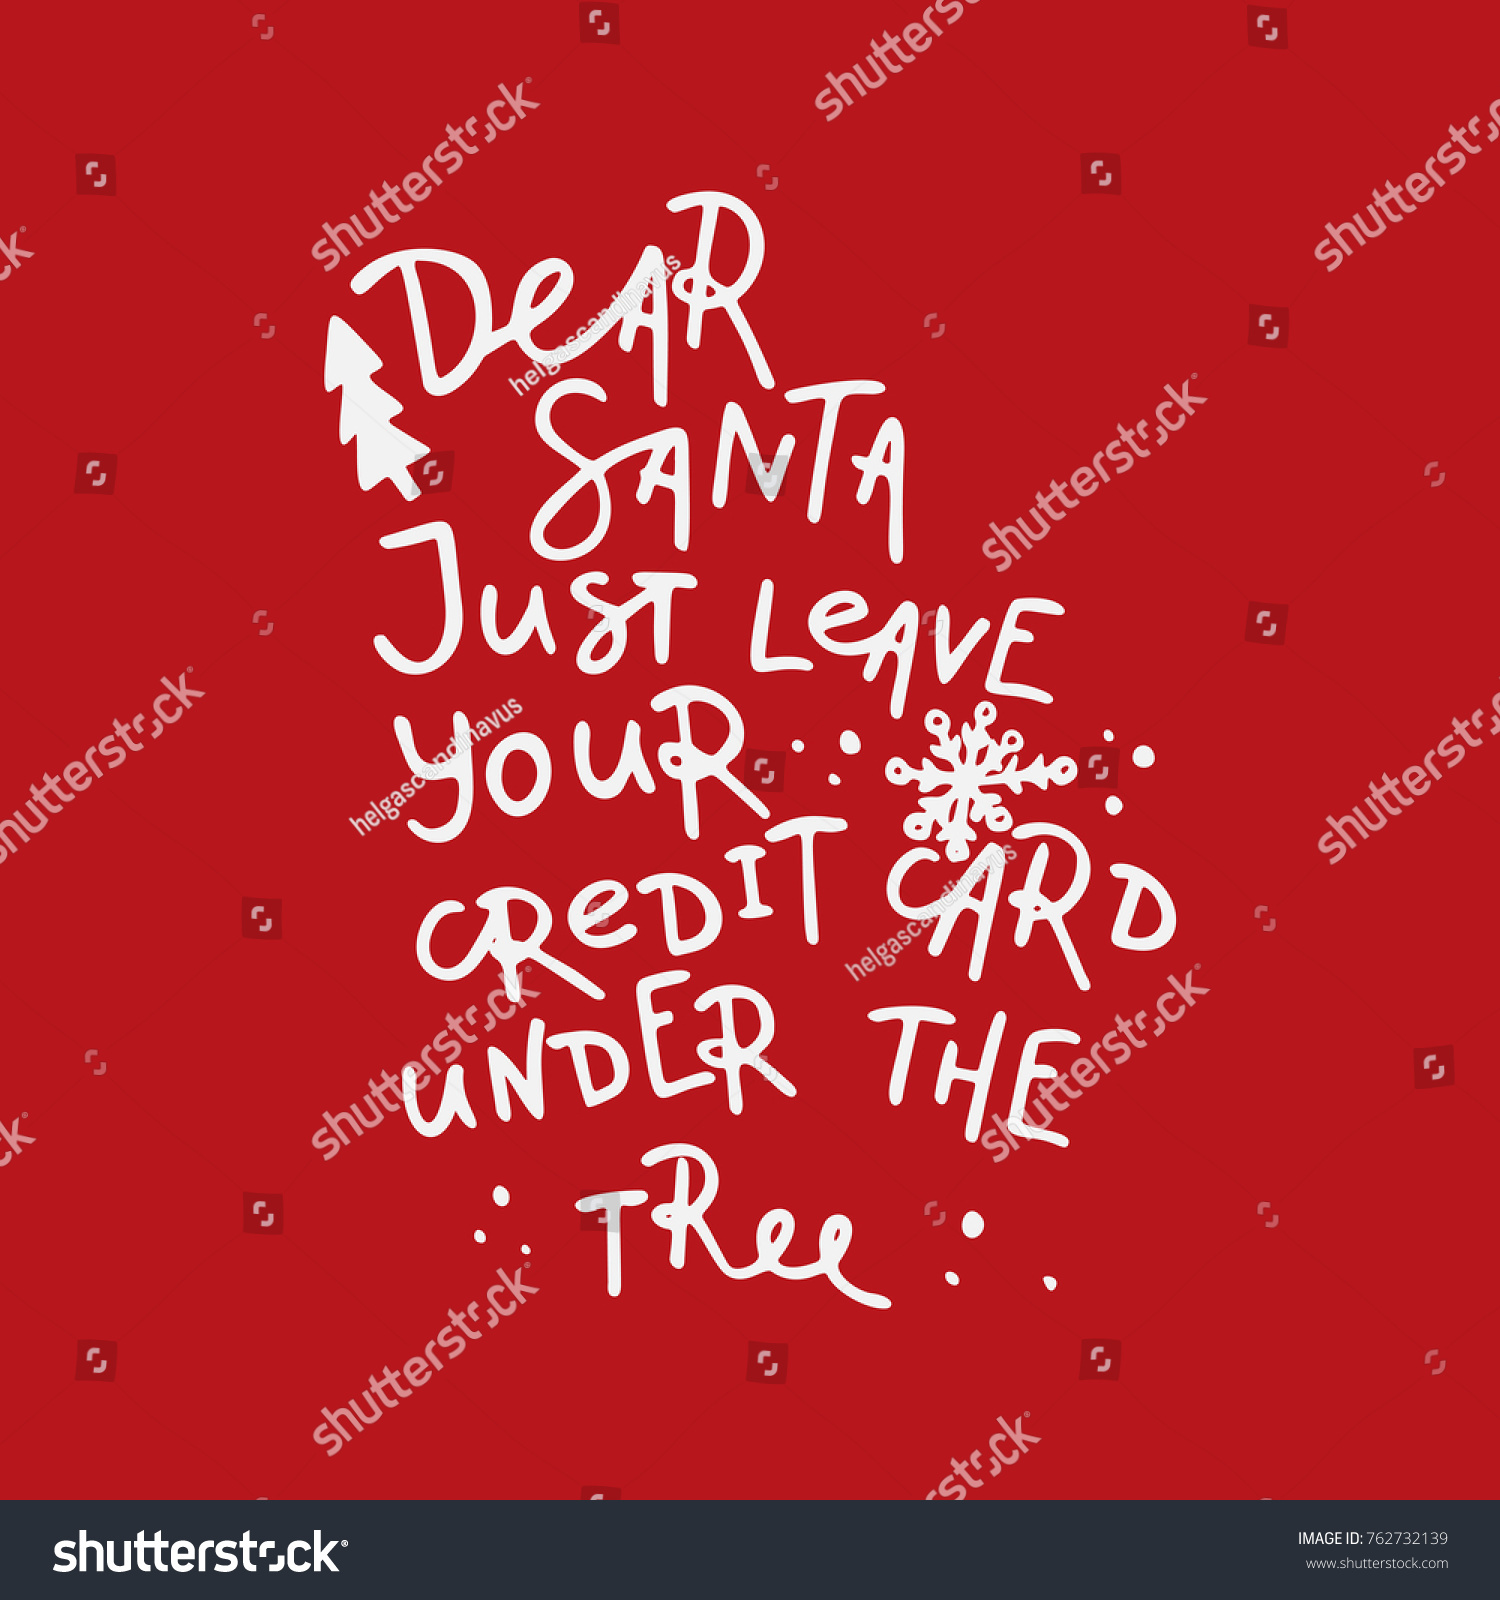 Dear Santa Let Me Explain Handlettering Stock Vector (Royalty Free ...